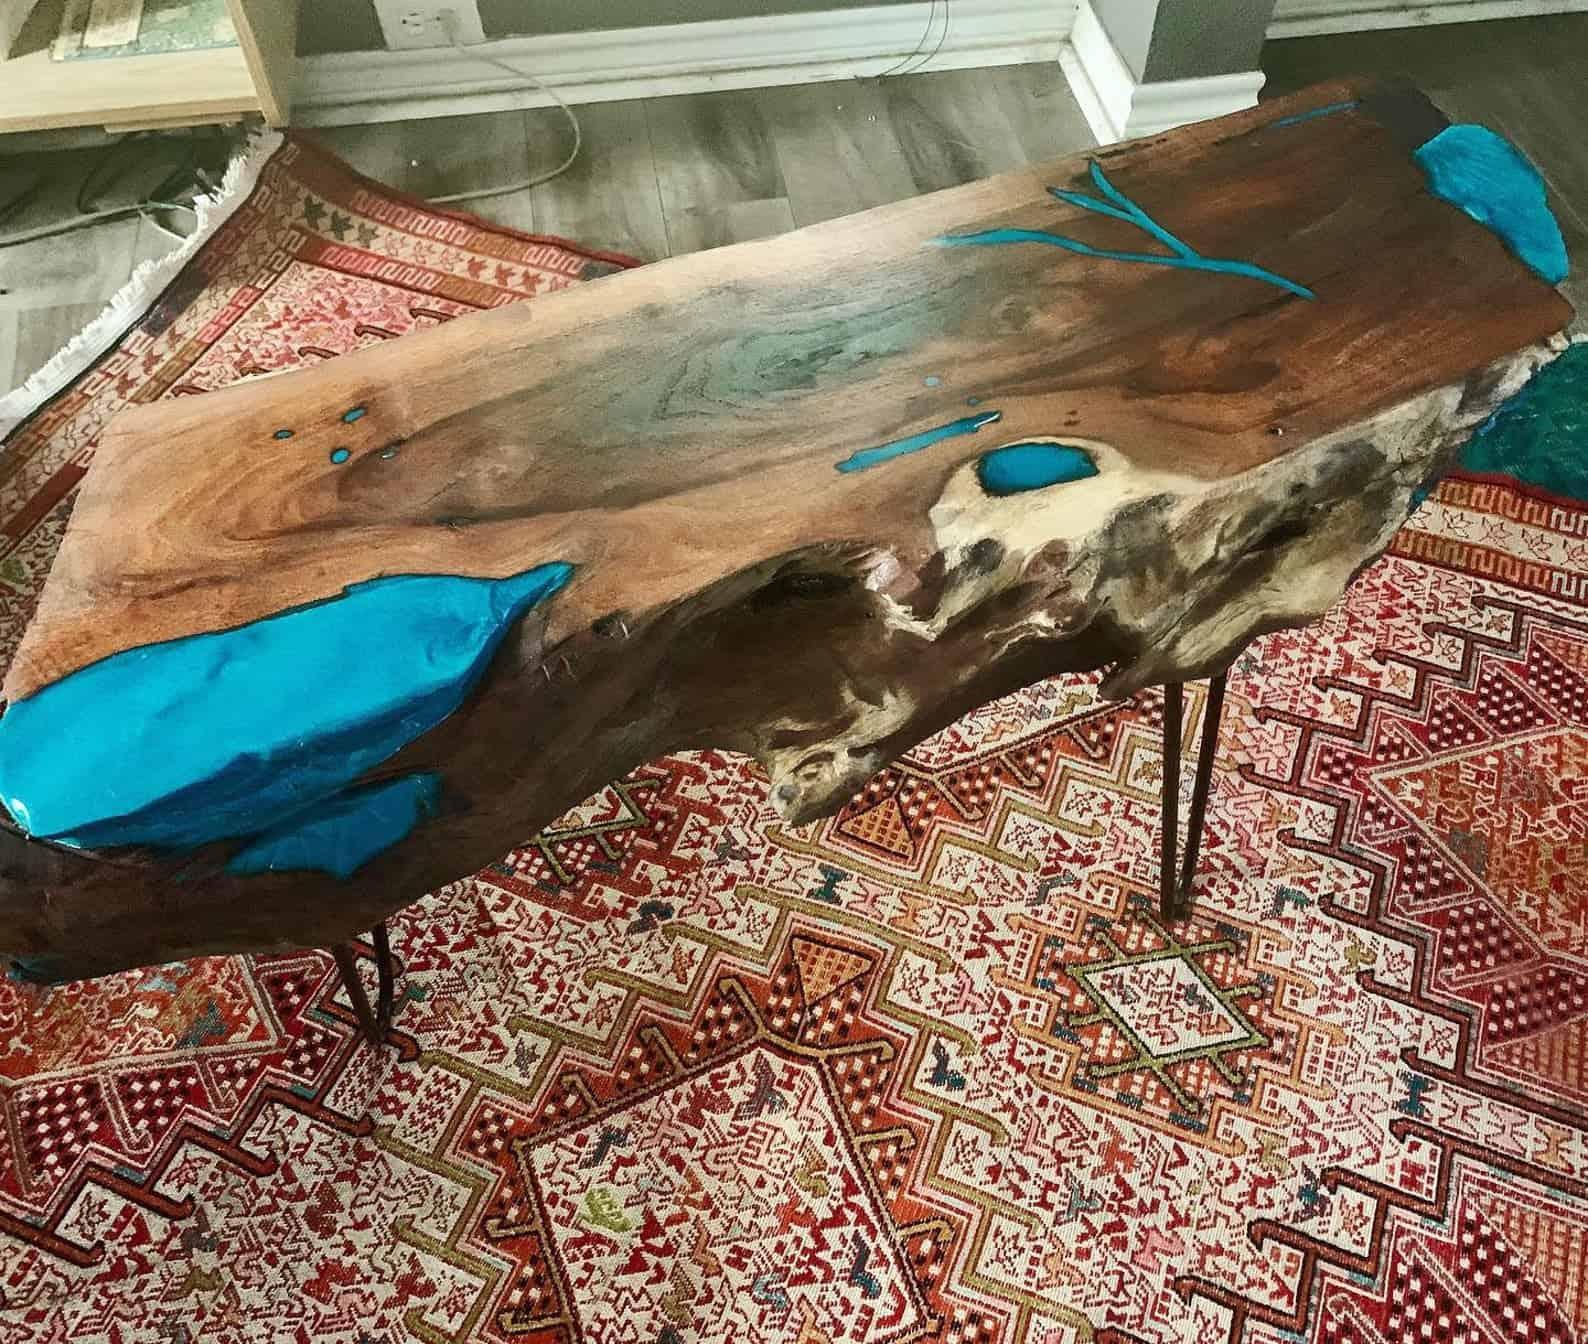 Resin river mesquite burl table